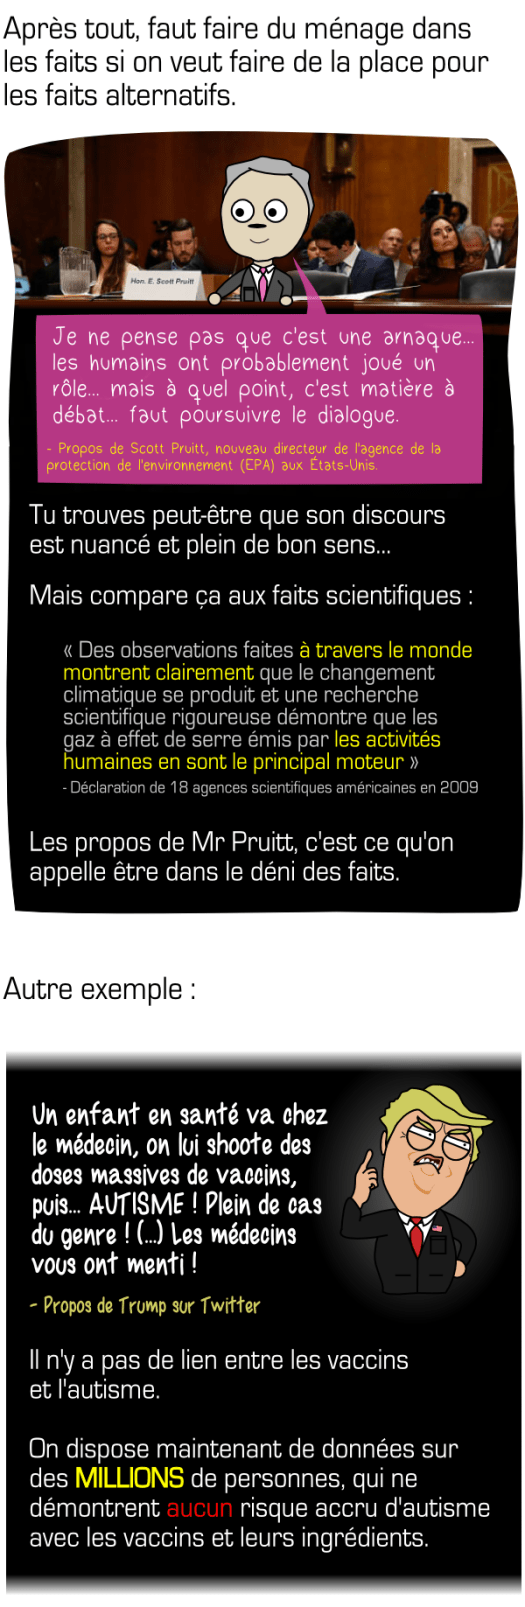 faits-alternatifs-04